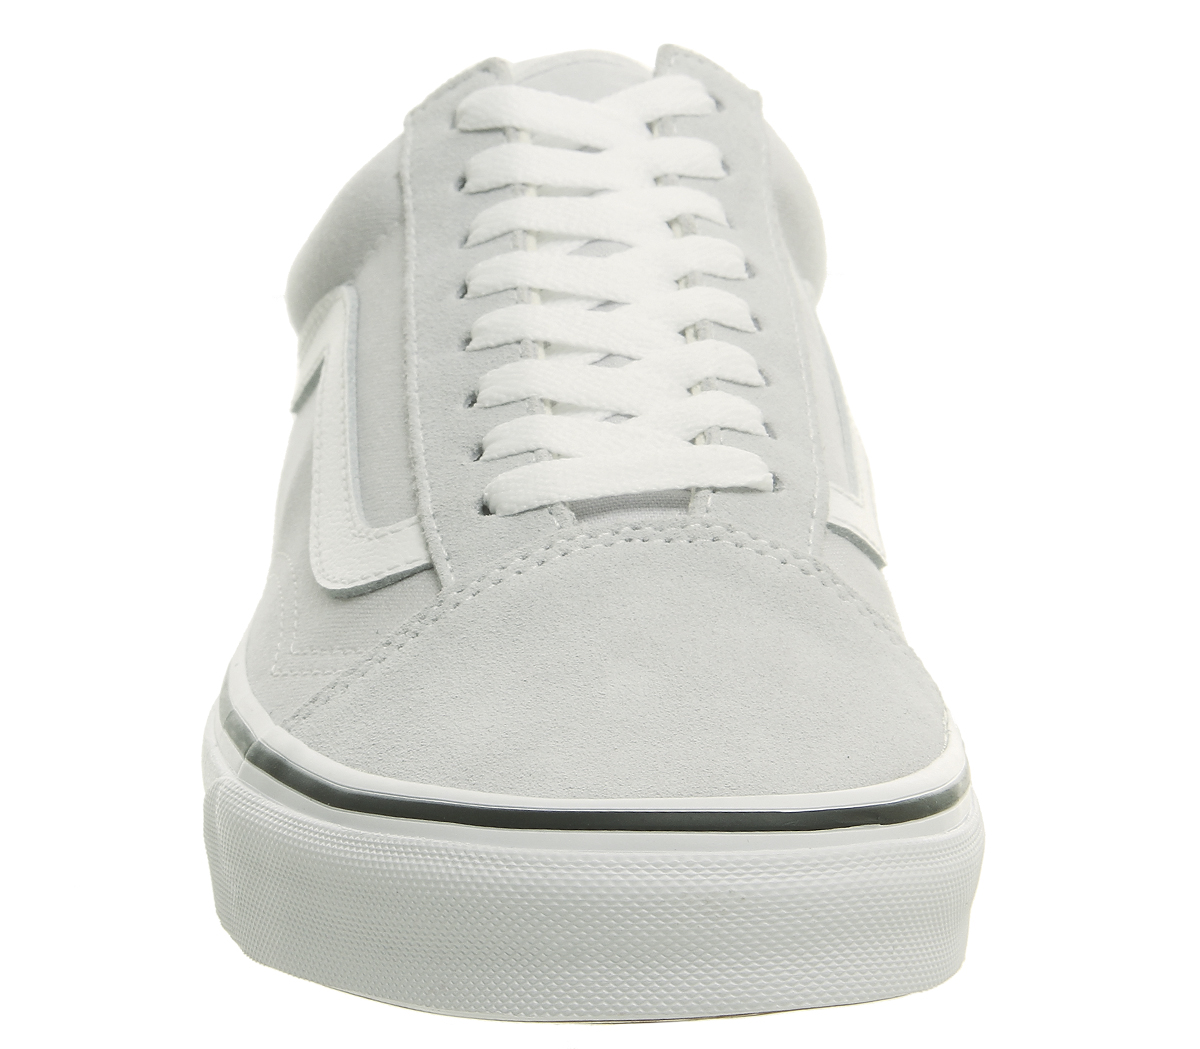 e309b2bd5 CENTINELA Hombres Vans Old Skool entrenadores gris amanecer verdadero  formadores blanco zapatos